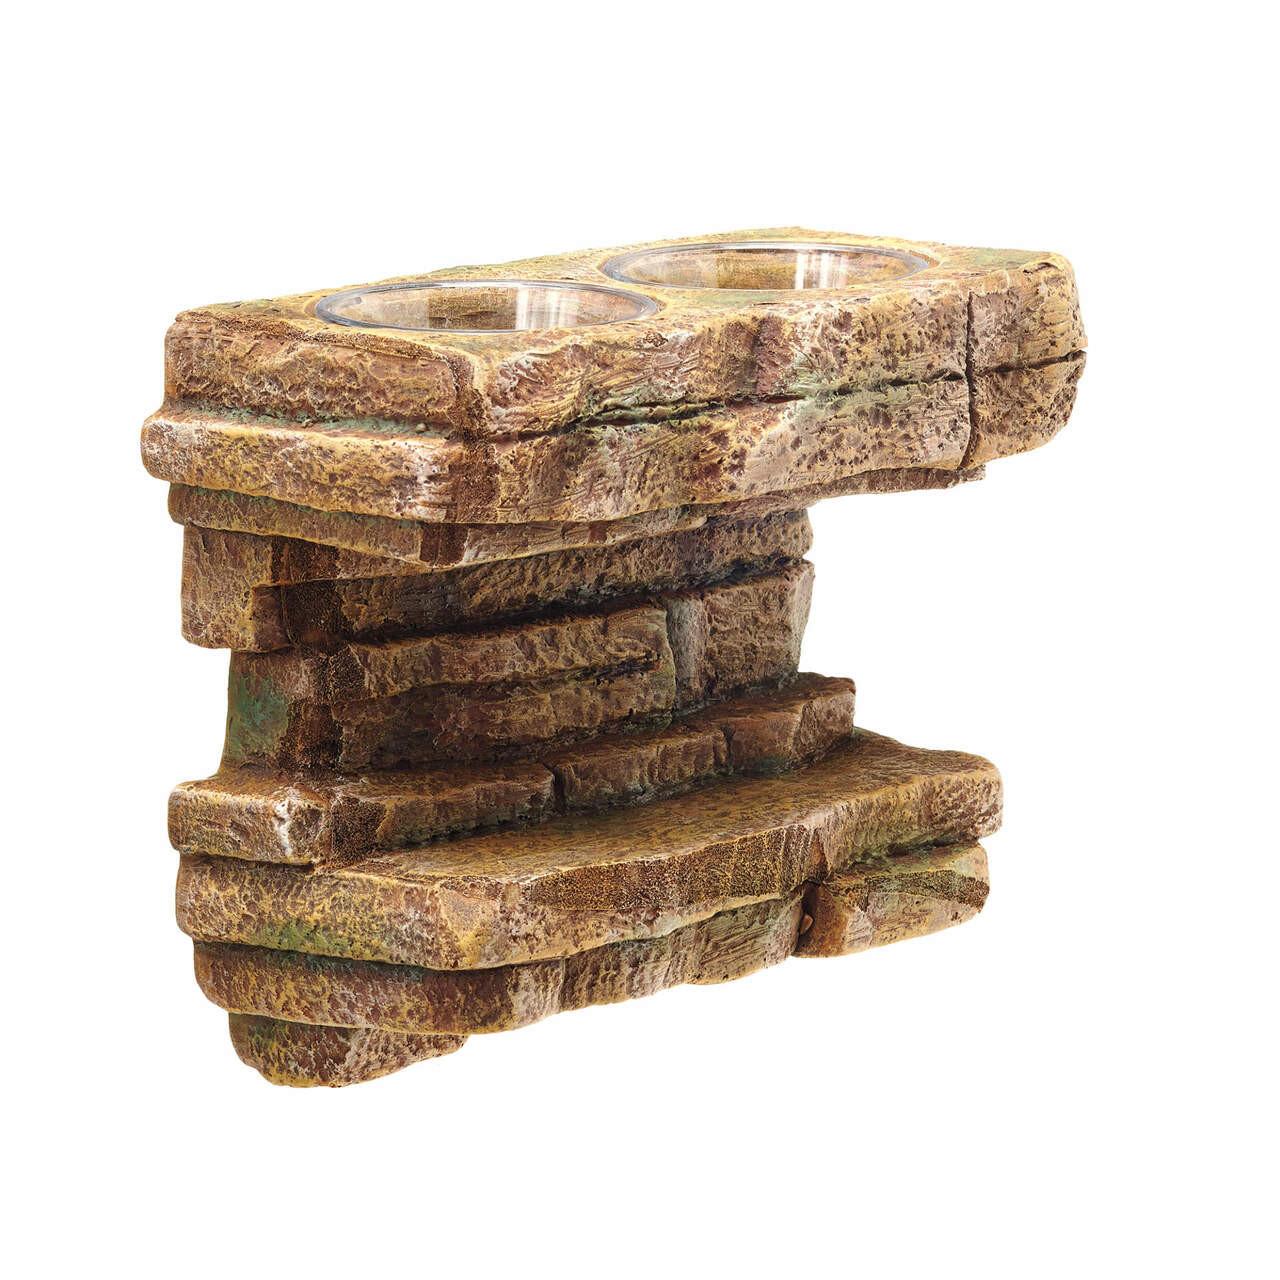 ZIlla Zilla Rock Feeding Ledge 10.5 x 4.625 x 7